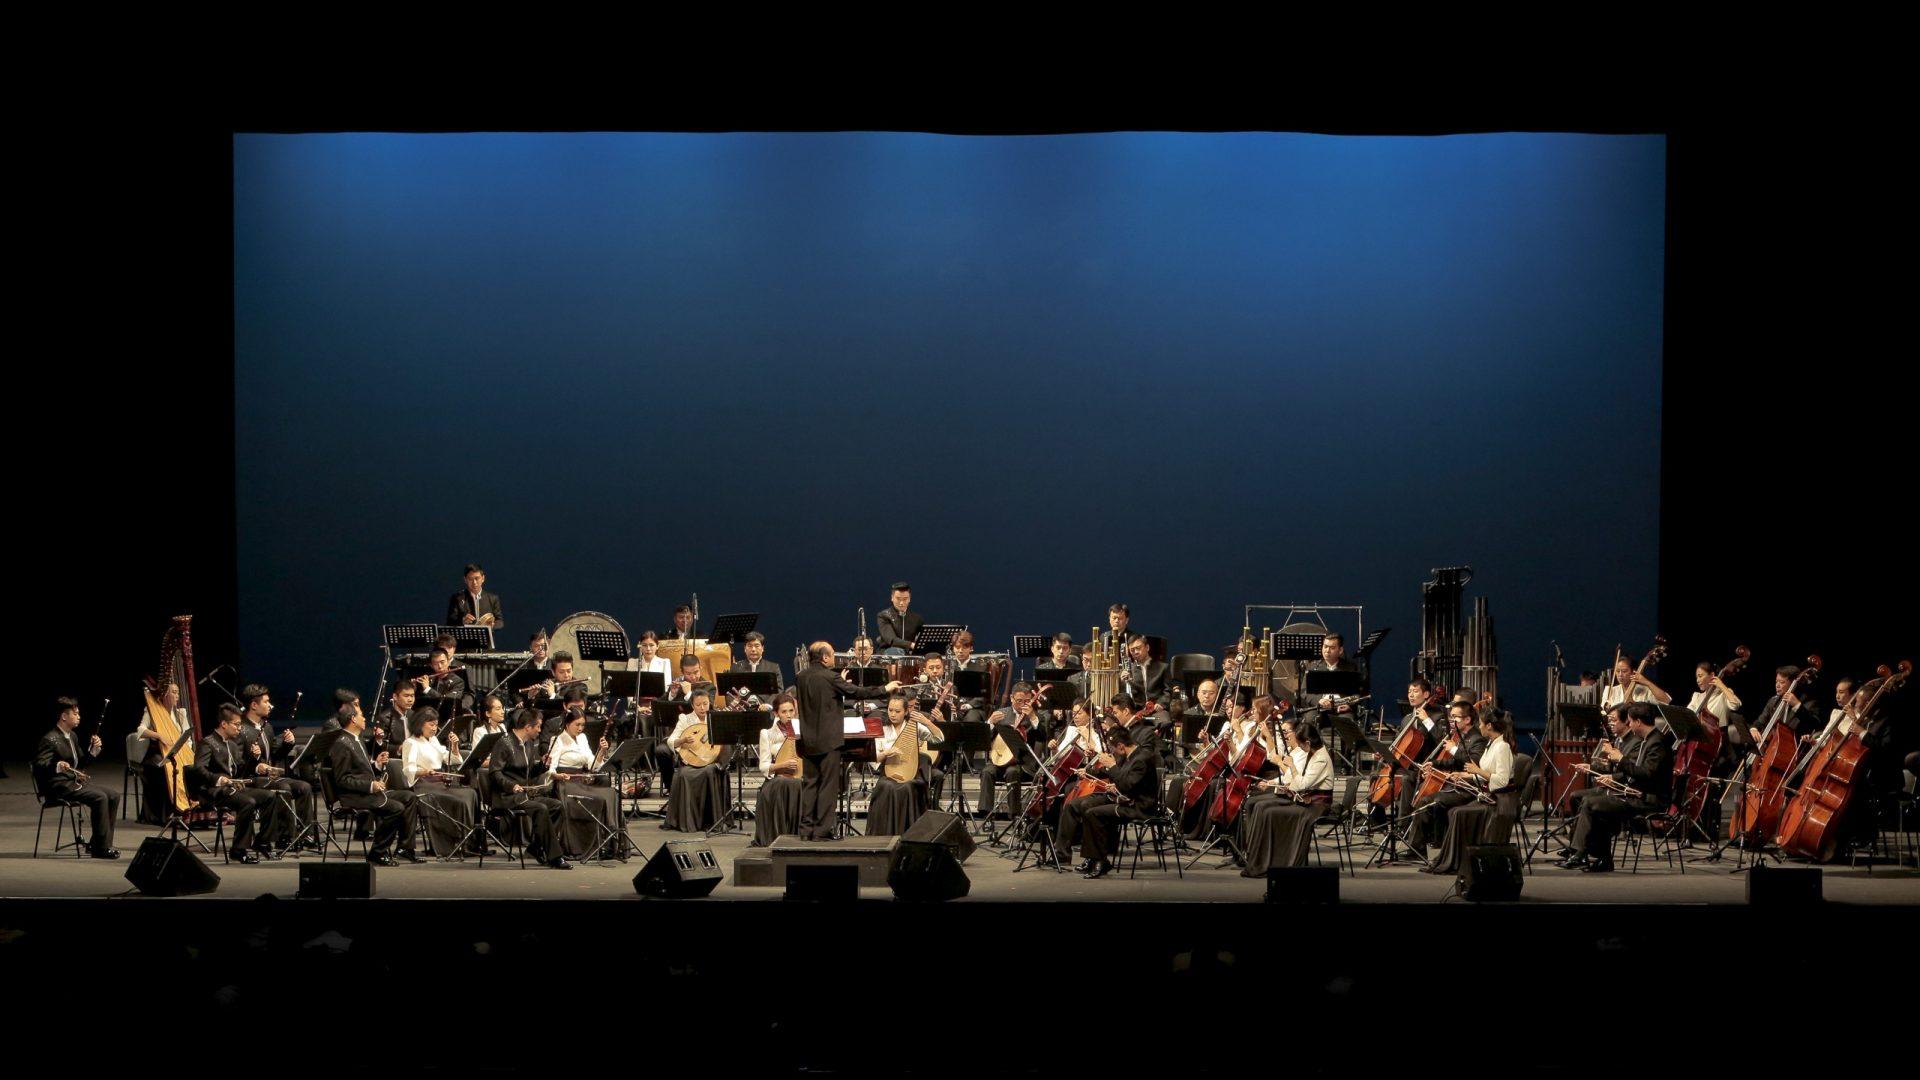 orquesta-sinfonica-de-china_0171